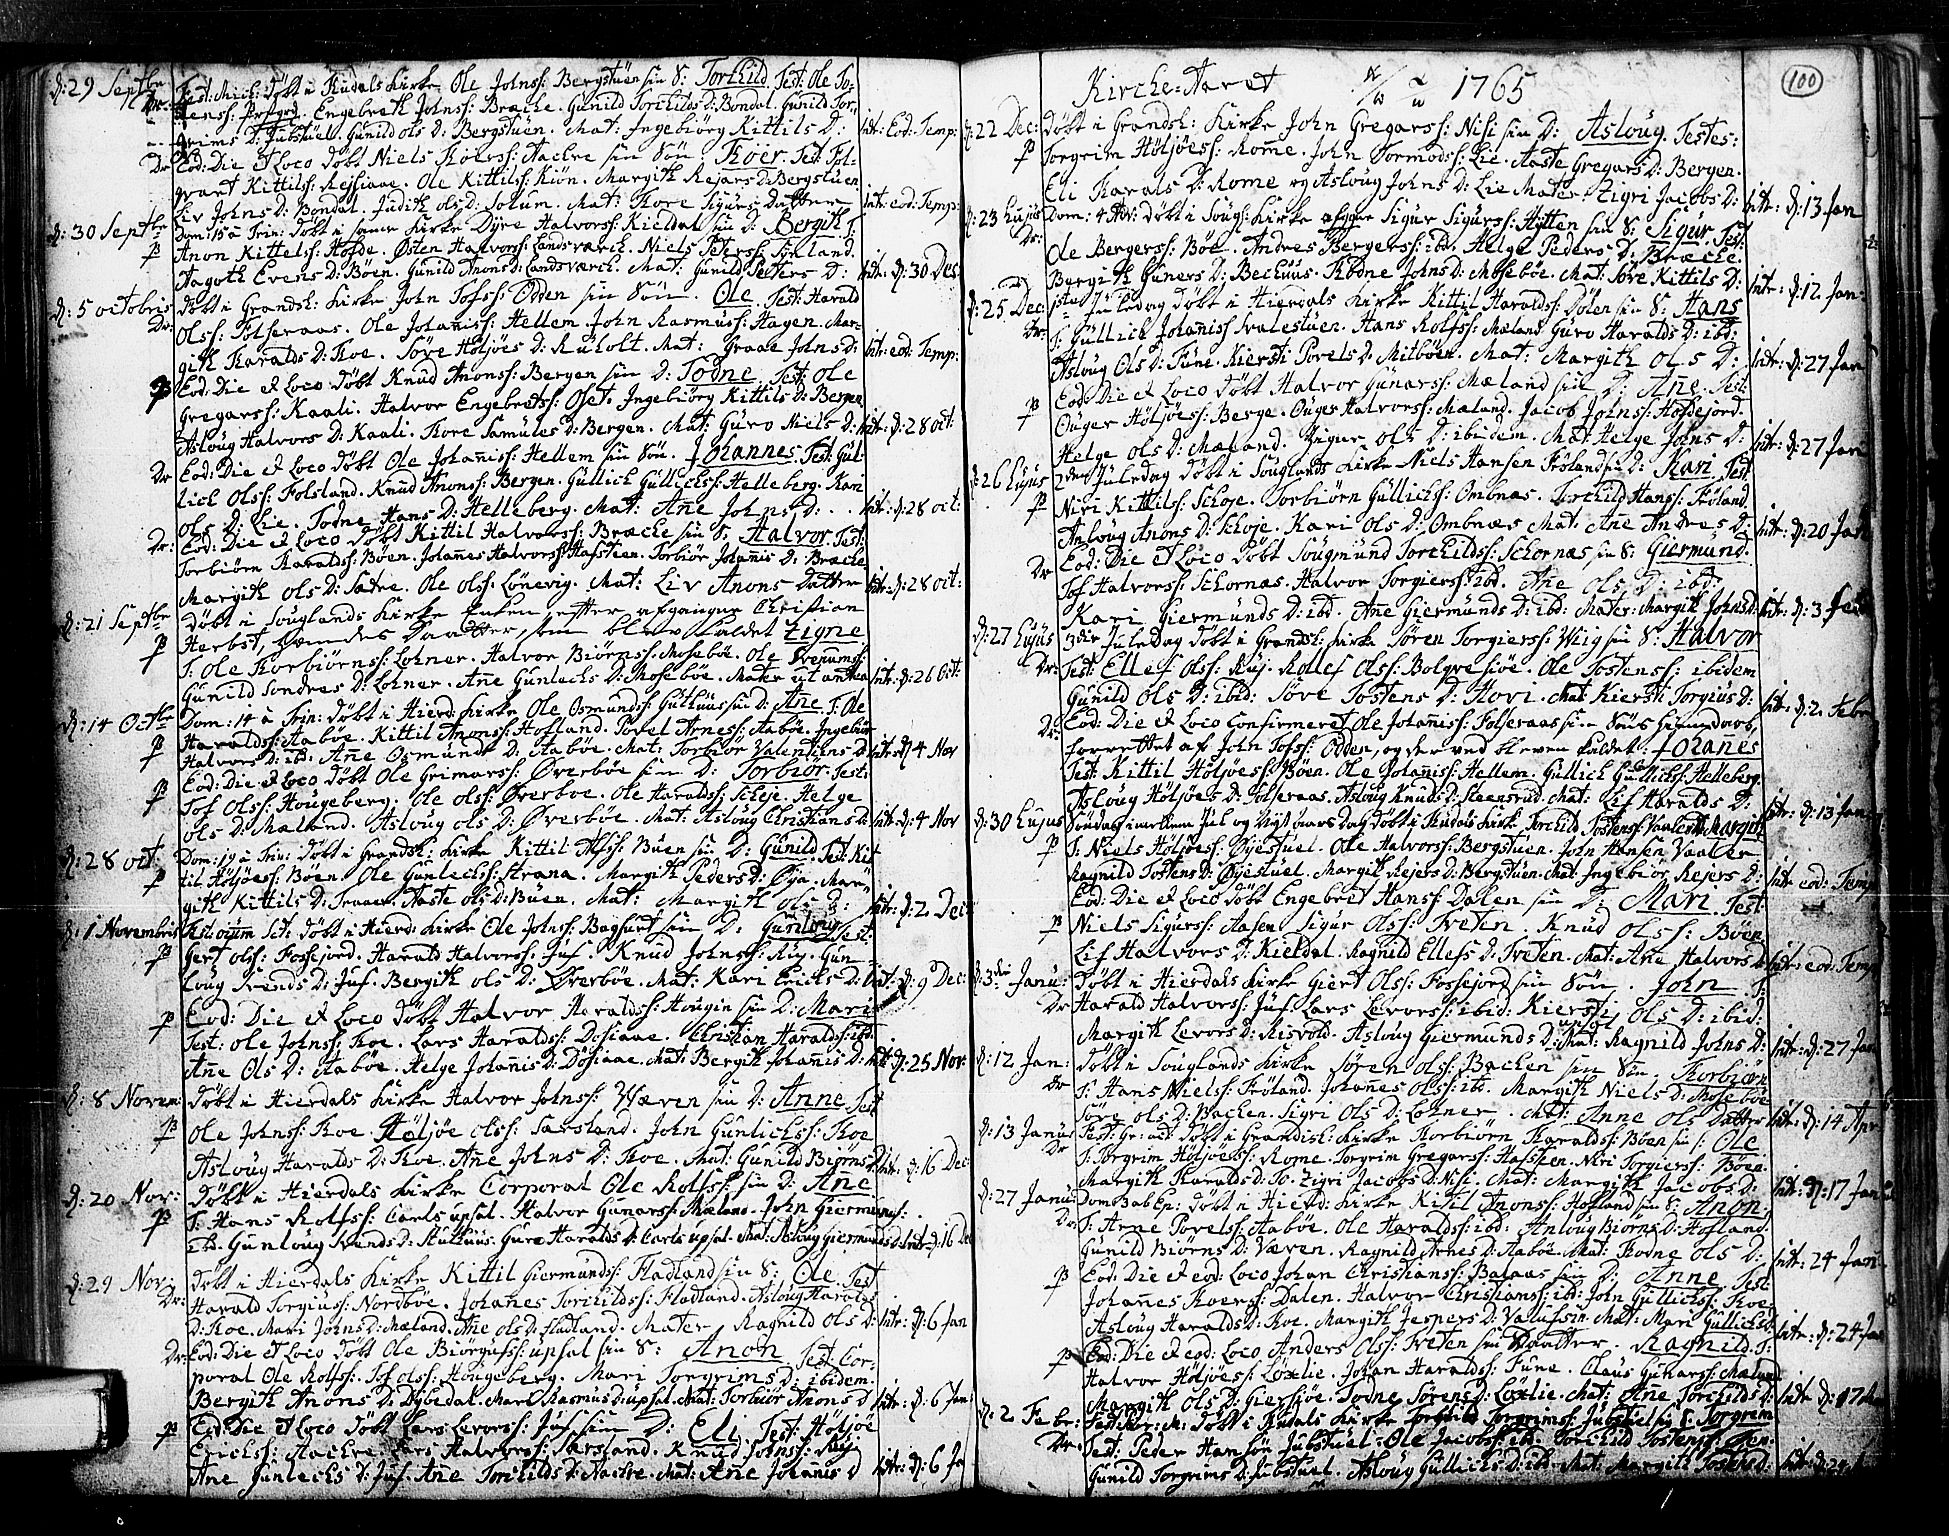 SAKO, Hjartdal kirkebøker, F/Fa/L0003: Ministerialbok nr. I 3, 1727-1775, s. 100